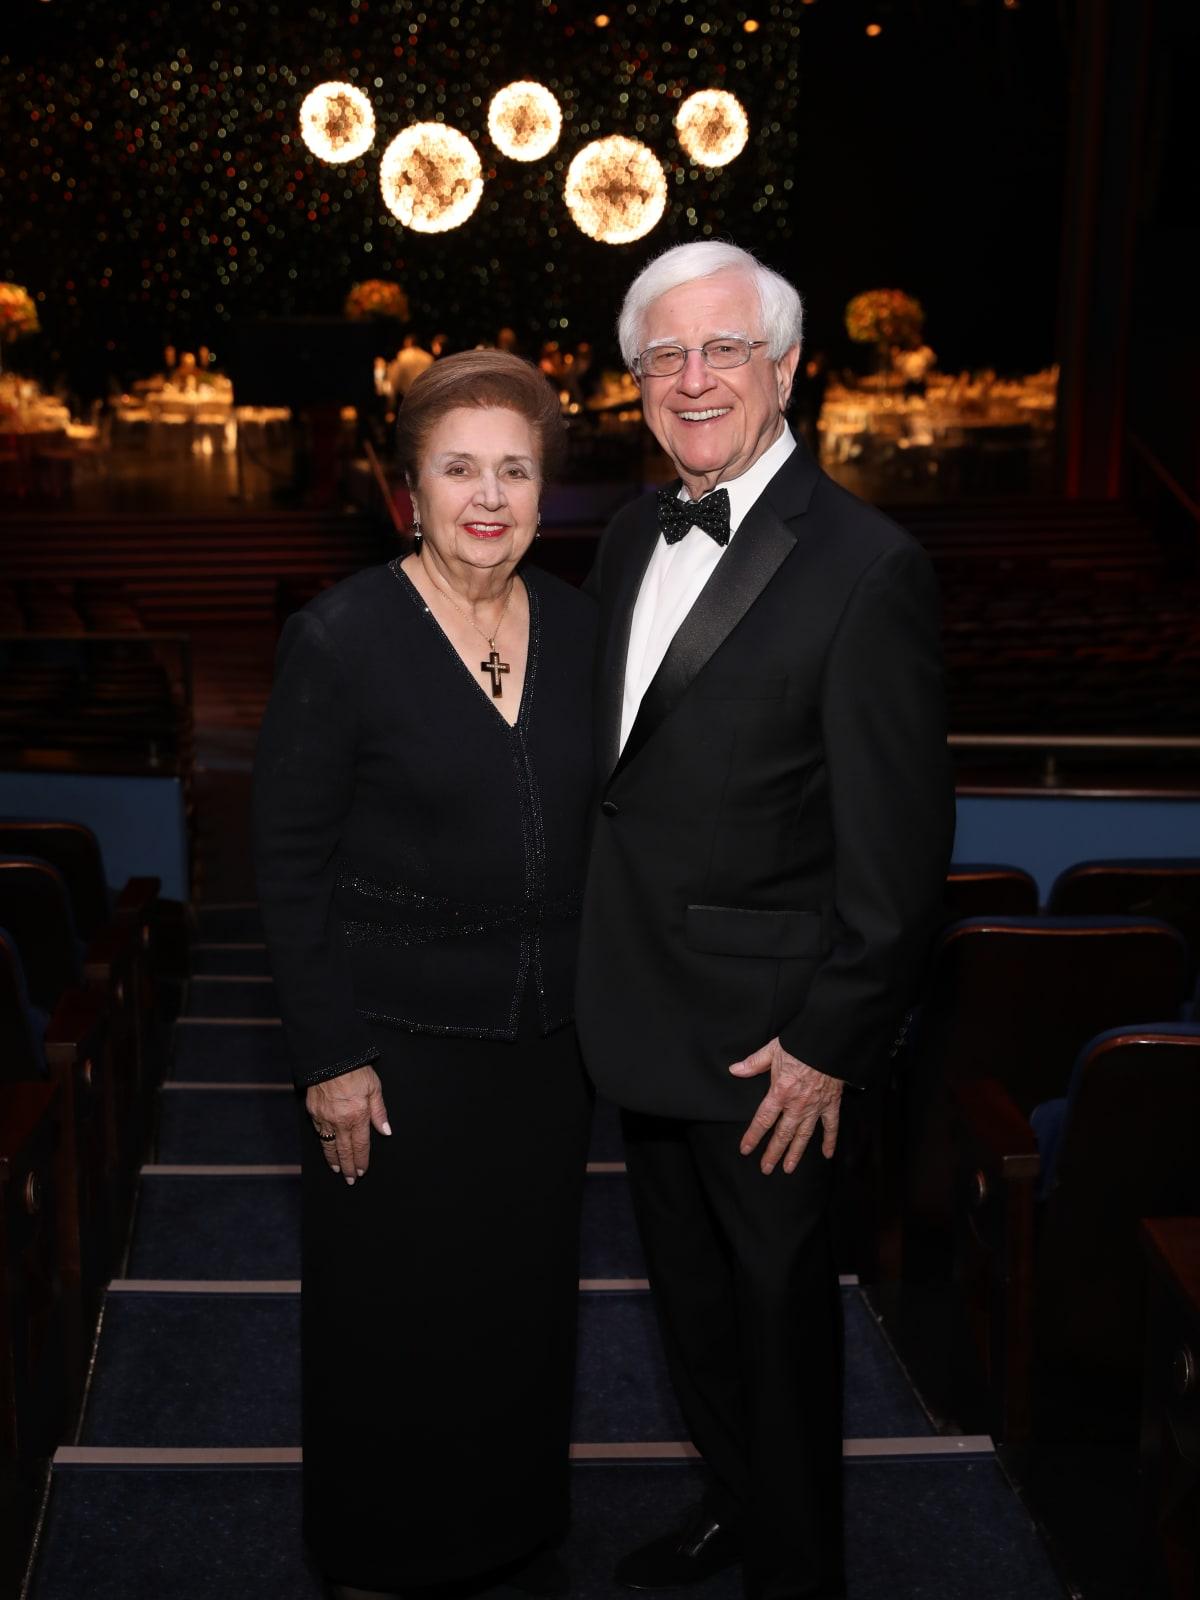 TUTS_Gala_Helen and Jim Shaffer_Photo Credit - Priscilla Dixon.jpg